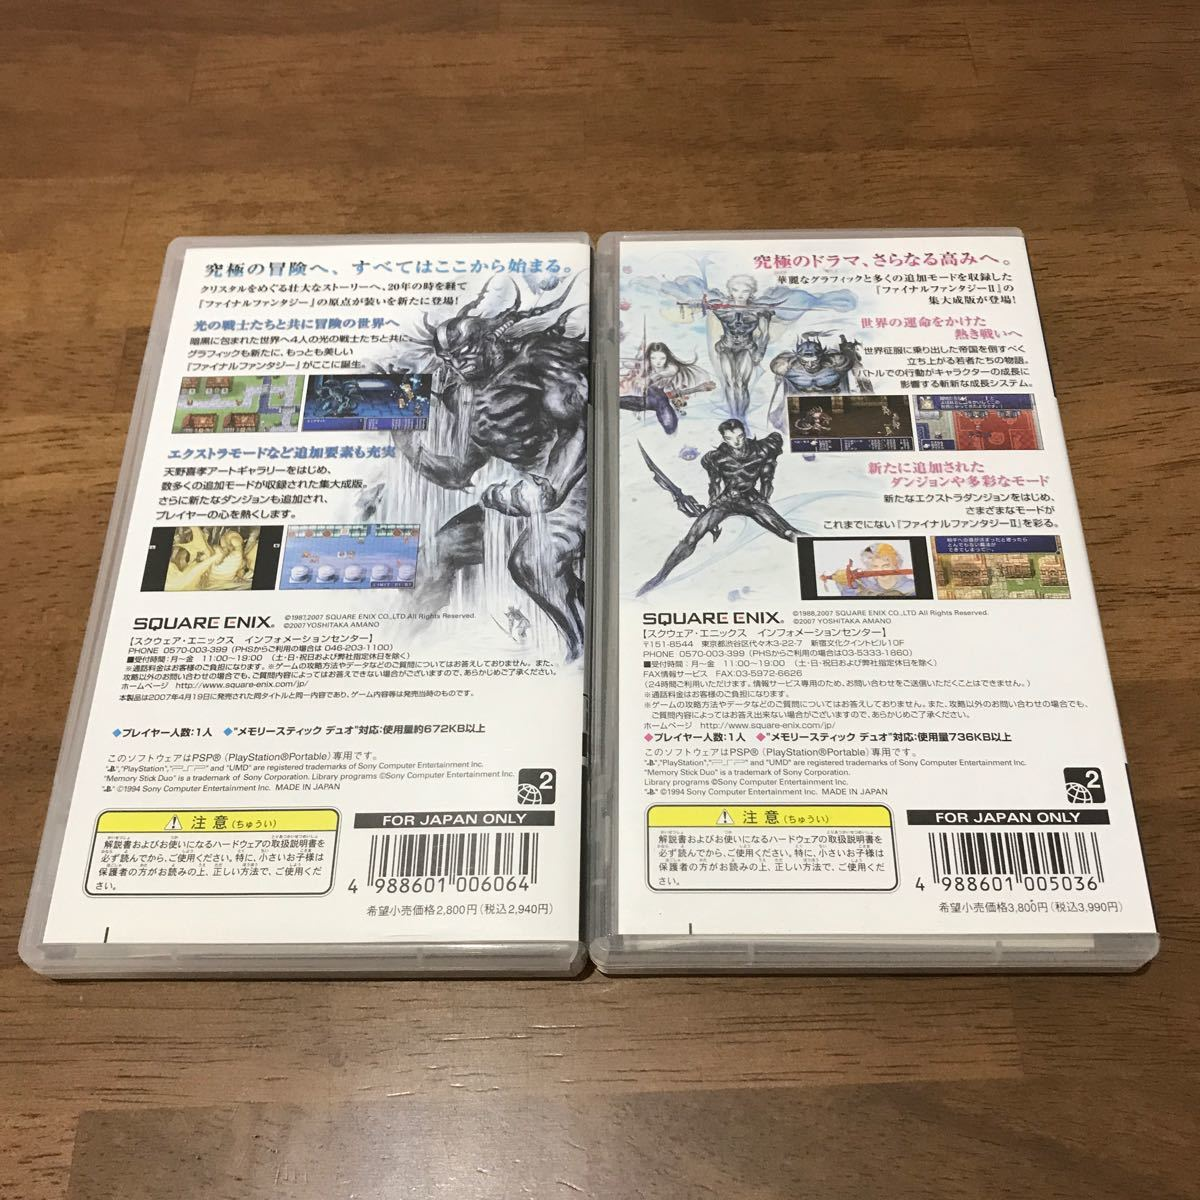 PSP ファイナルファンタジー 1 2 セット販売